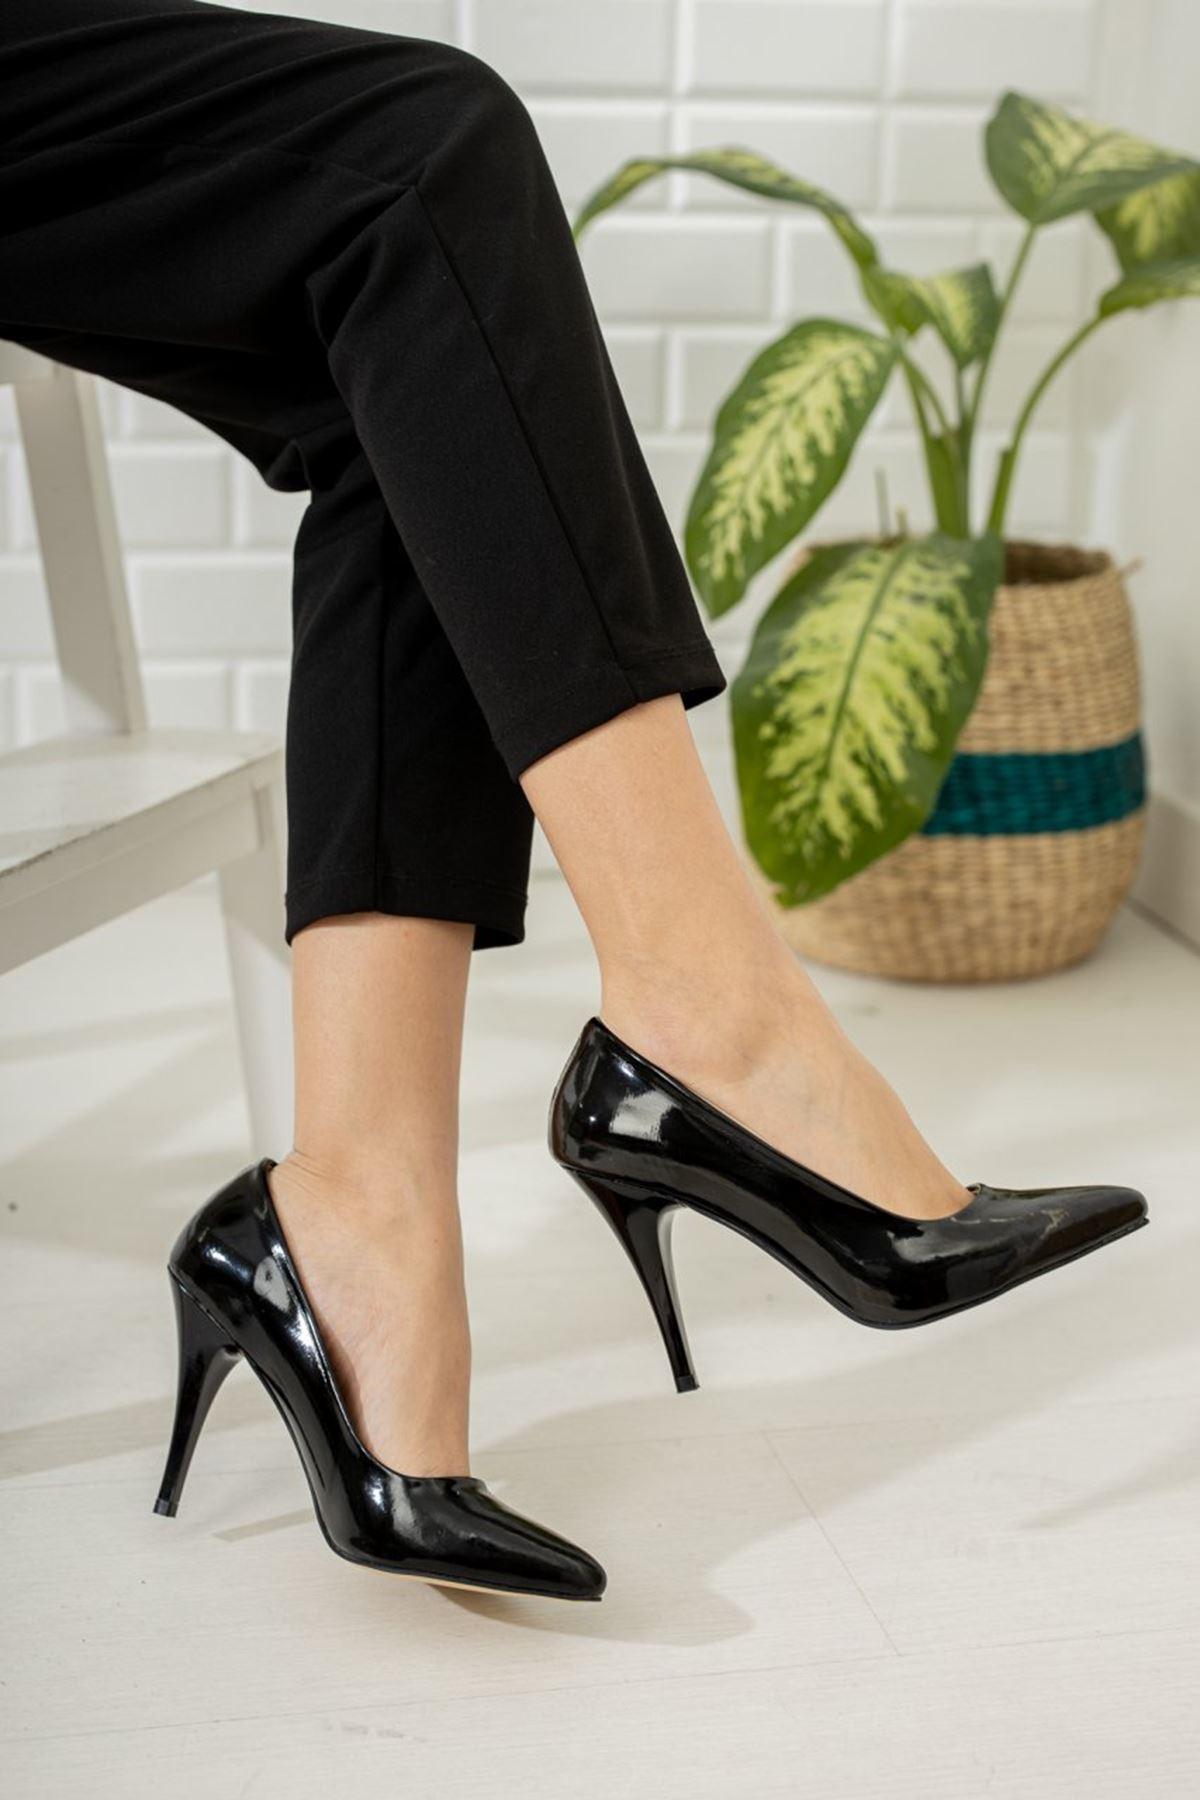 Kadın Ages Yüksek Topuklu  Siyah Rugan Stiletto